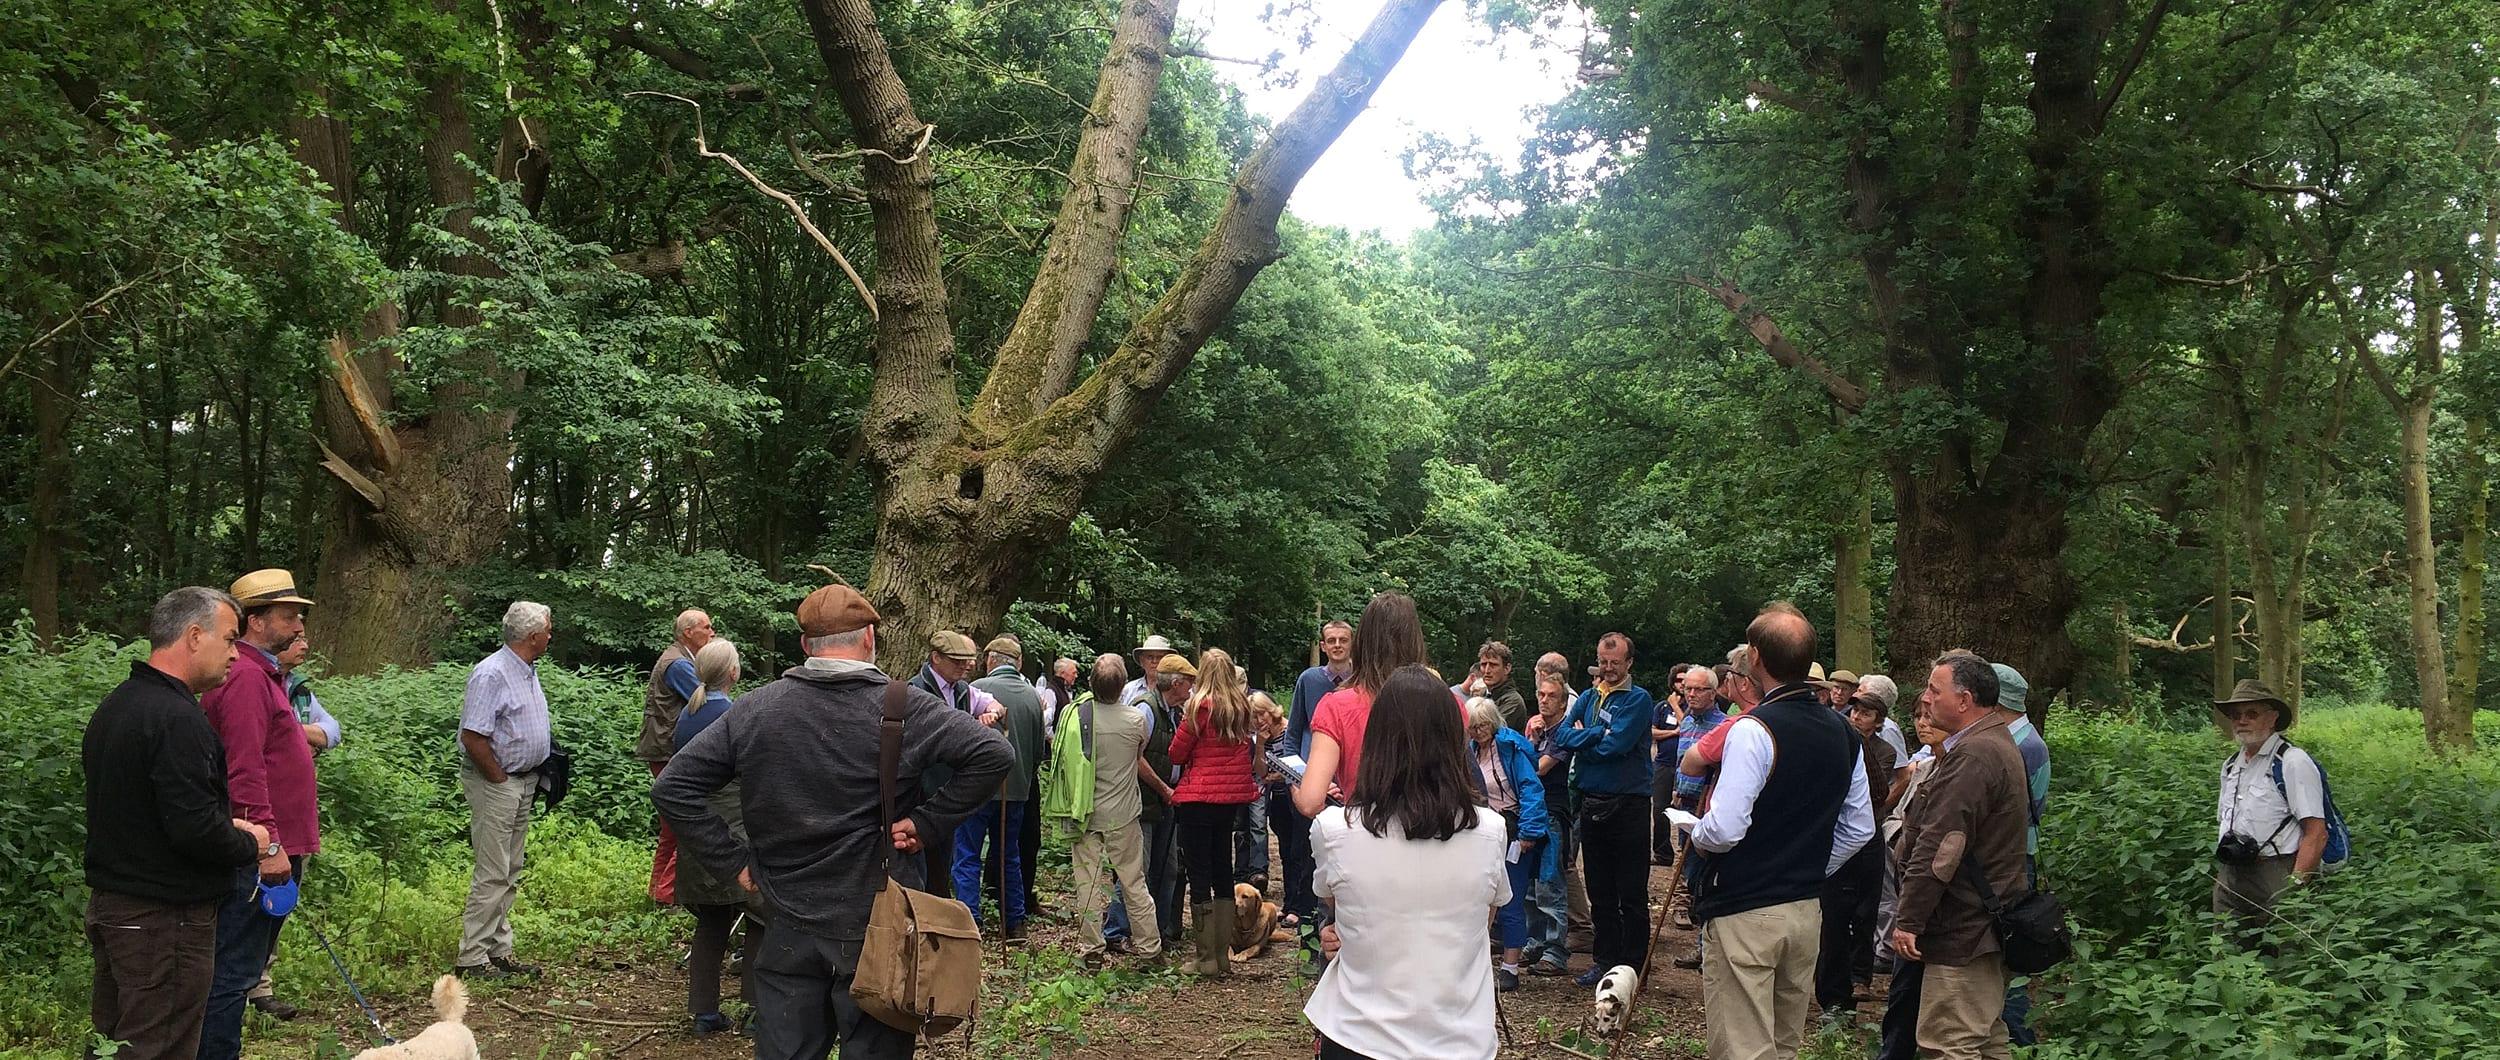 Forestry Society visit